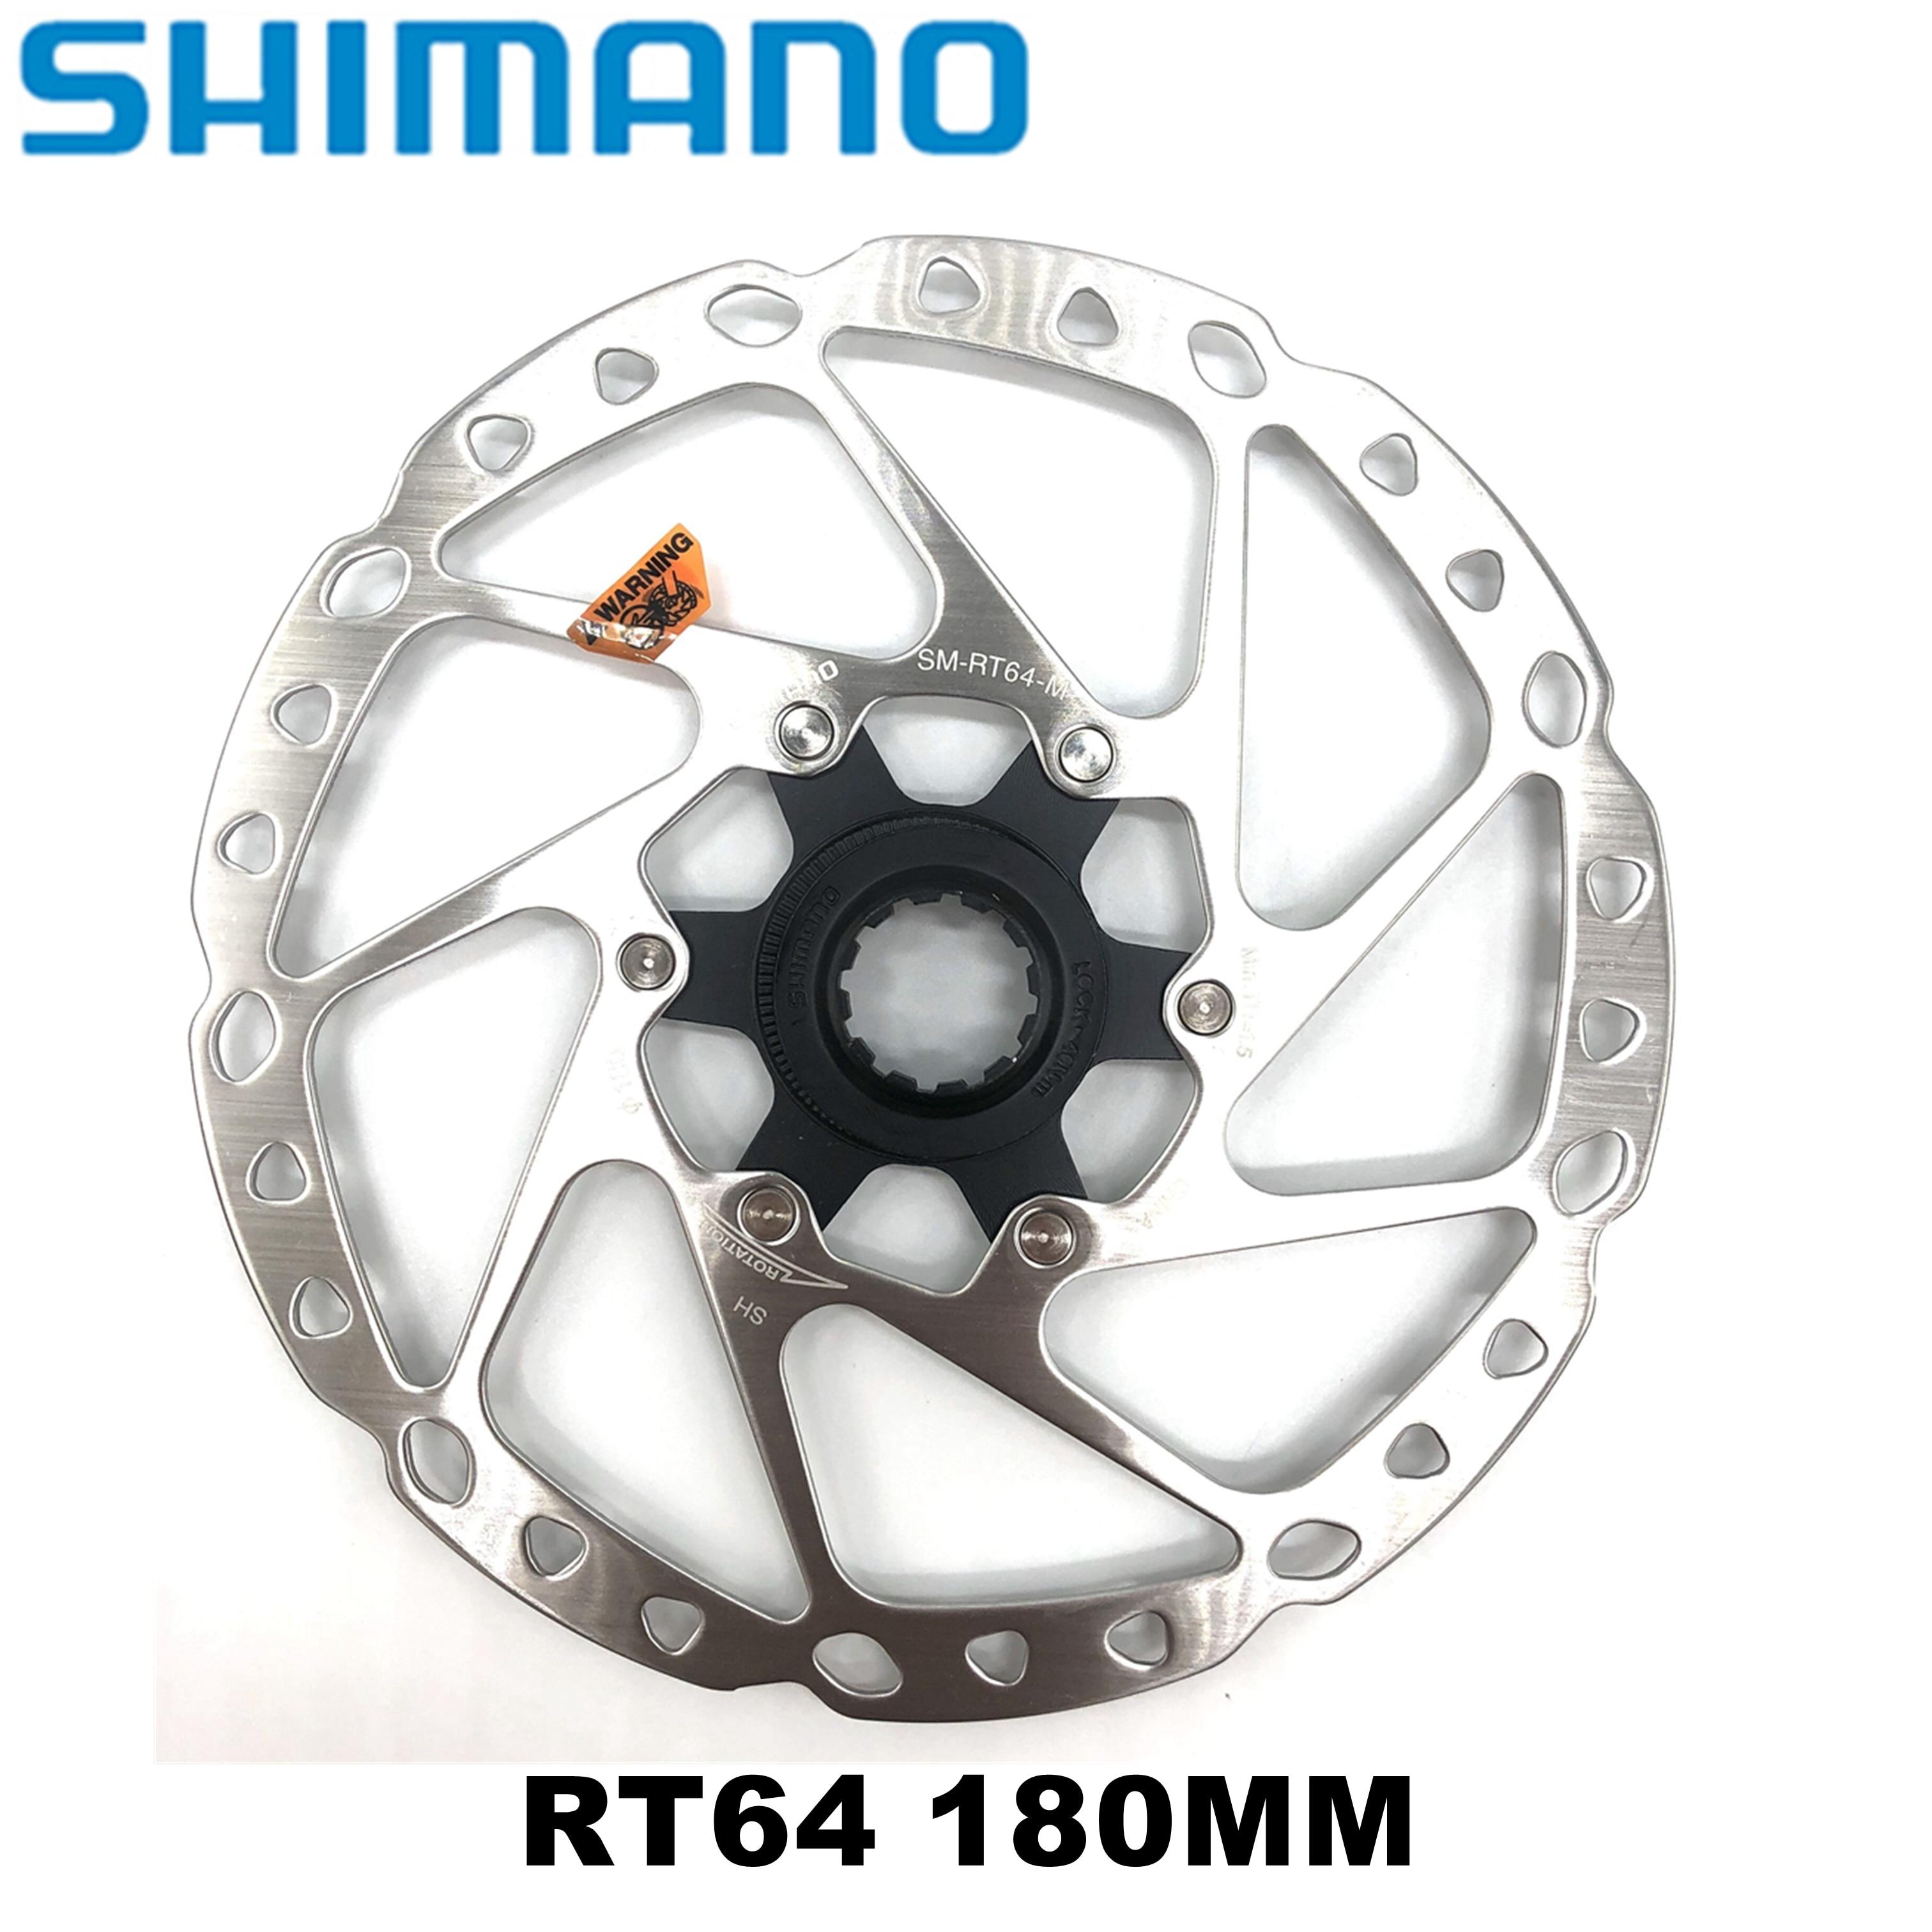 Shimano Deore SM RT64 RT54 Center lock rotor bike Disc Brake rotors 160MM 180mm SM-RT64 SM-RT54 for Deore M610 M6000